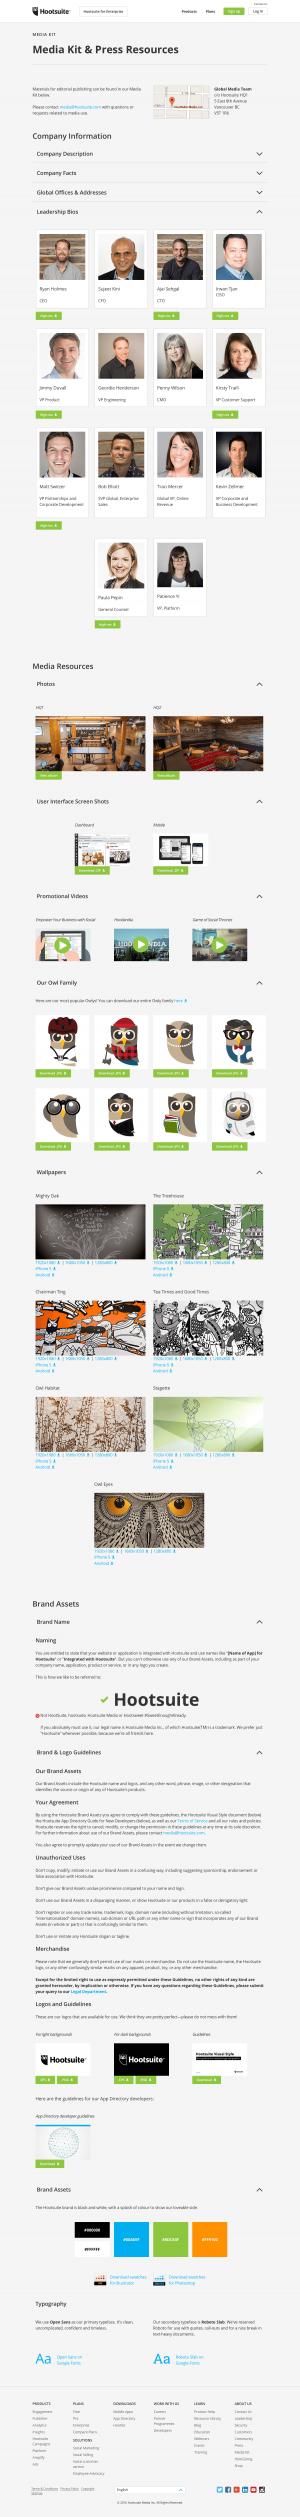 Mediakit page inspiration - Hootsuite